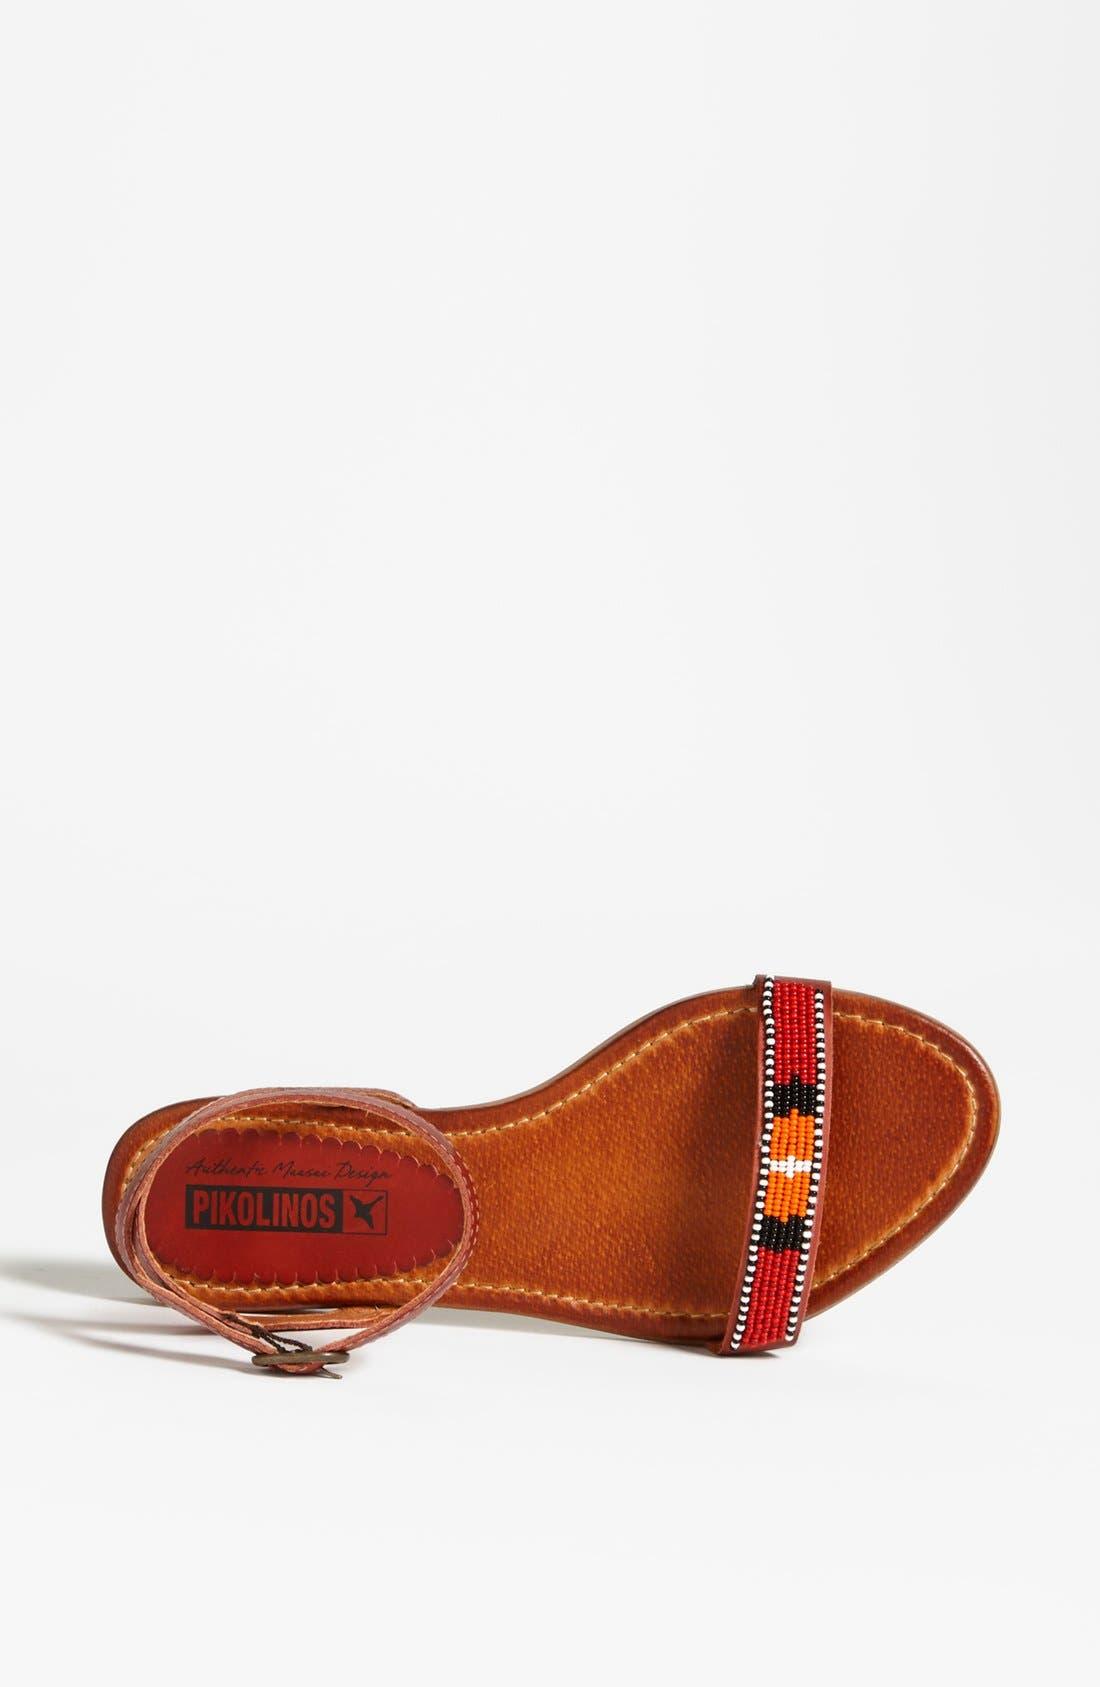 Alternate Image 3  - PIKOLINOS 'Formentera' Sandal